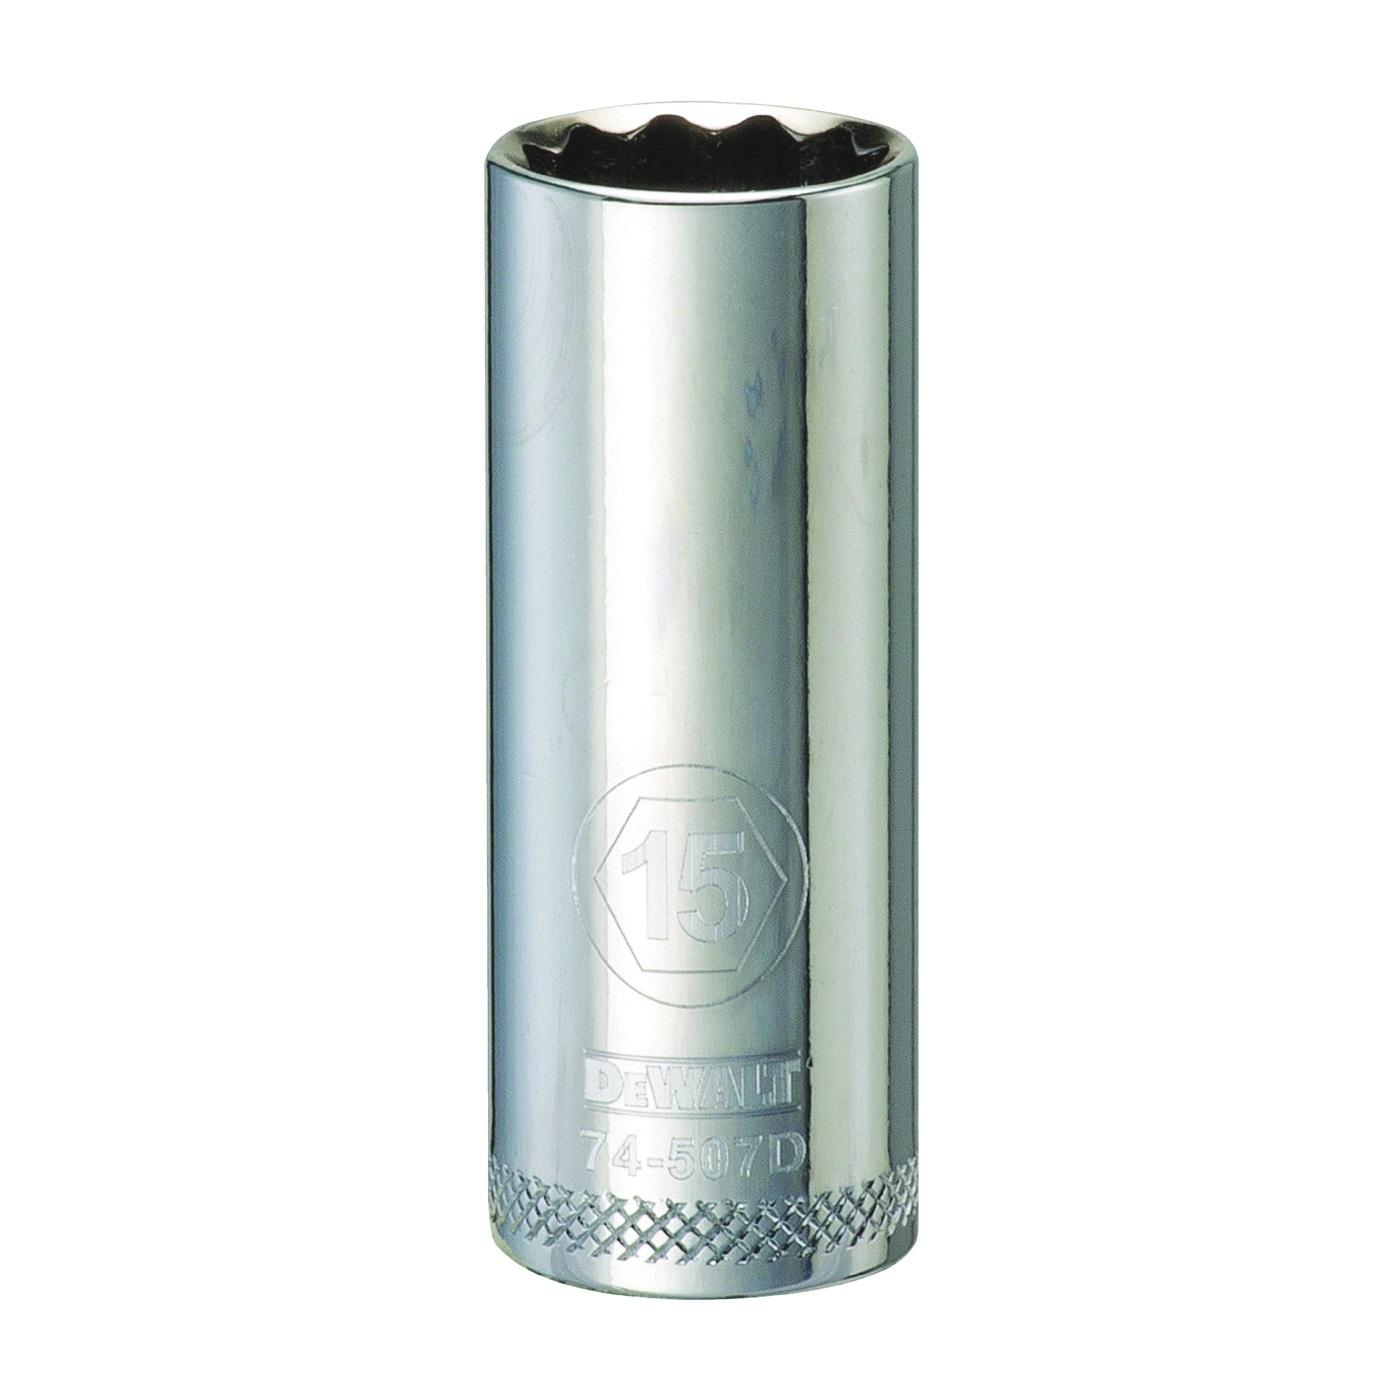 Picture of DeWALT DWMT74507OSP Drive Socket, 15 mm Socket, 3/8 in Drive, 12 -Point, Vanadium Steel, Polished Chrome